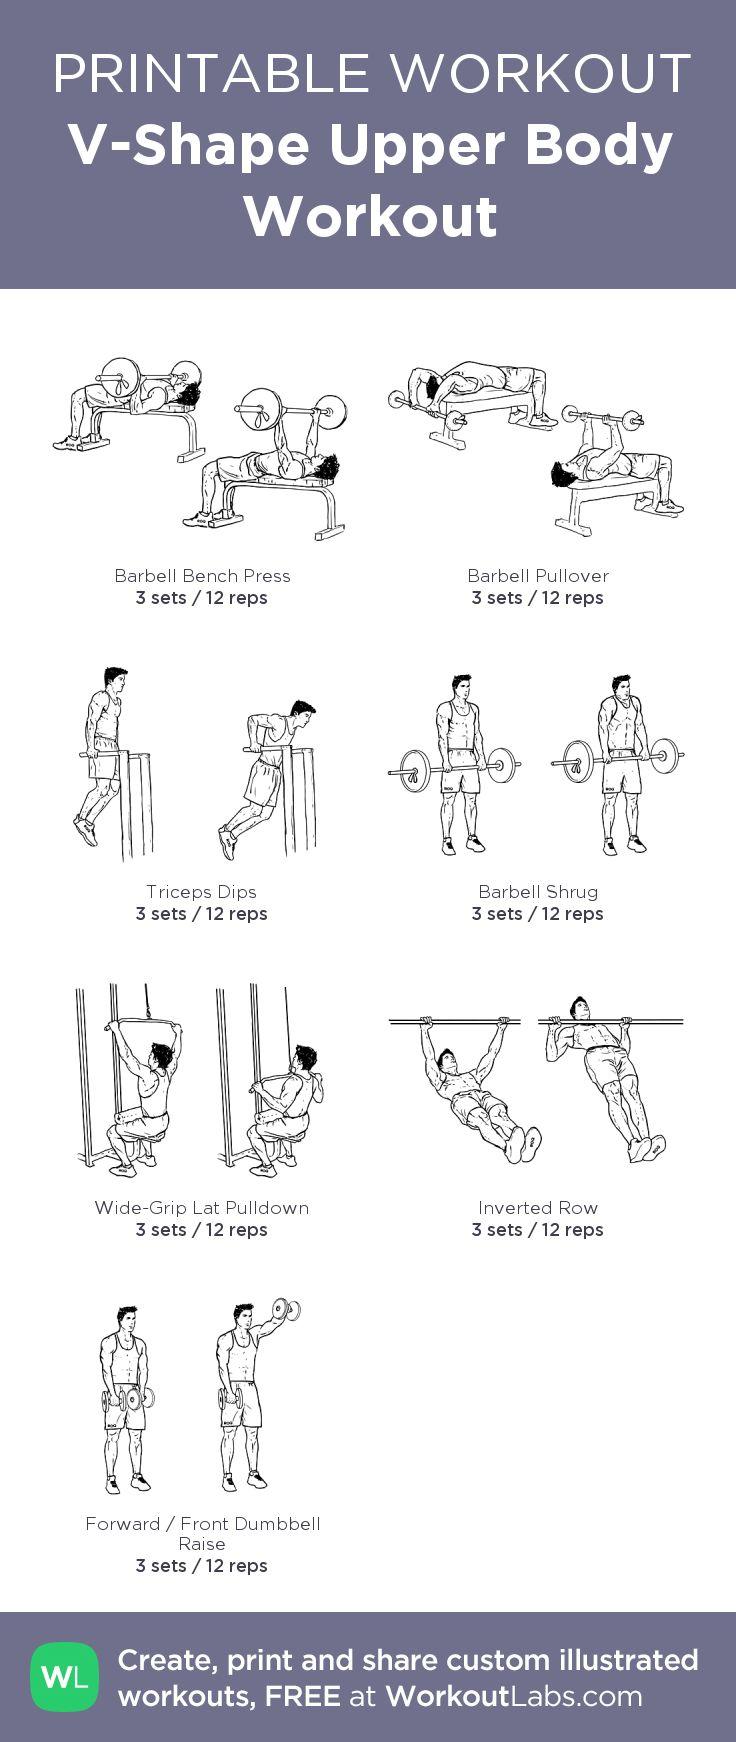 V-Shape Upper Body Workout:my custom printable workout by @WorkoutLabs #workoutlabs #customworkout